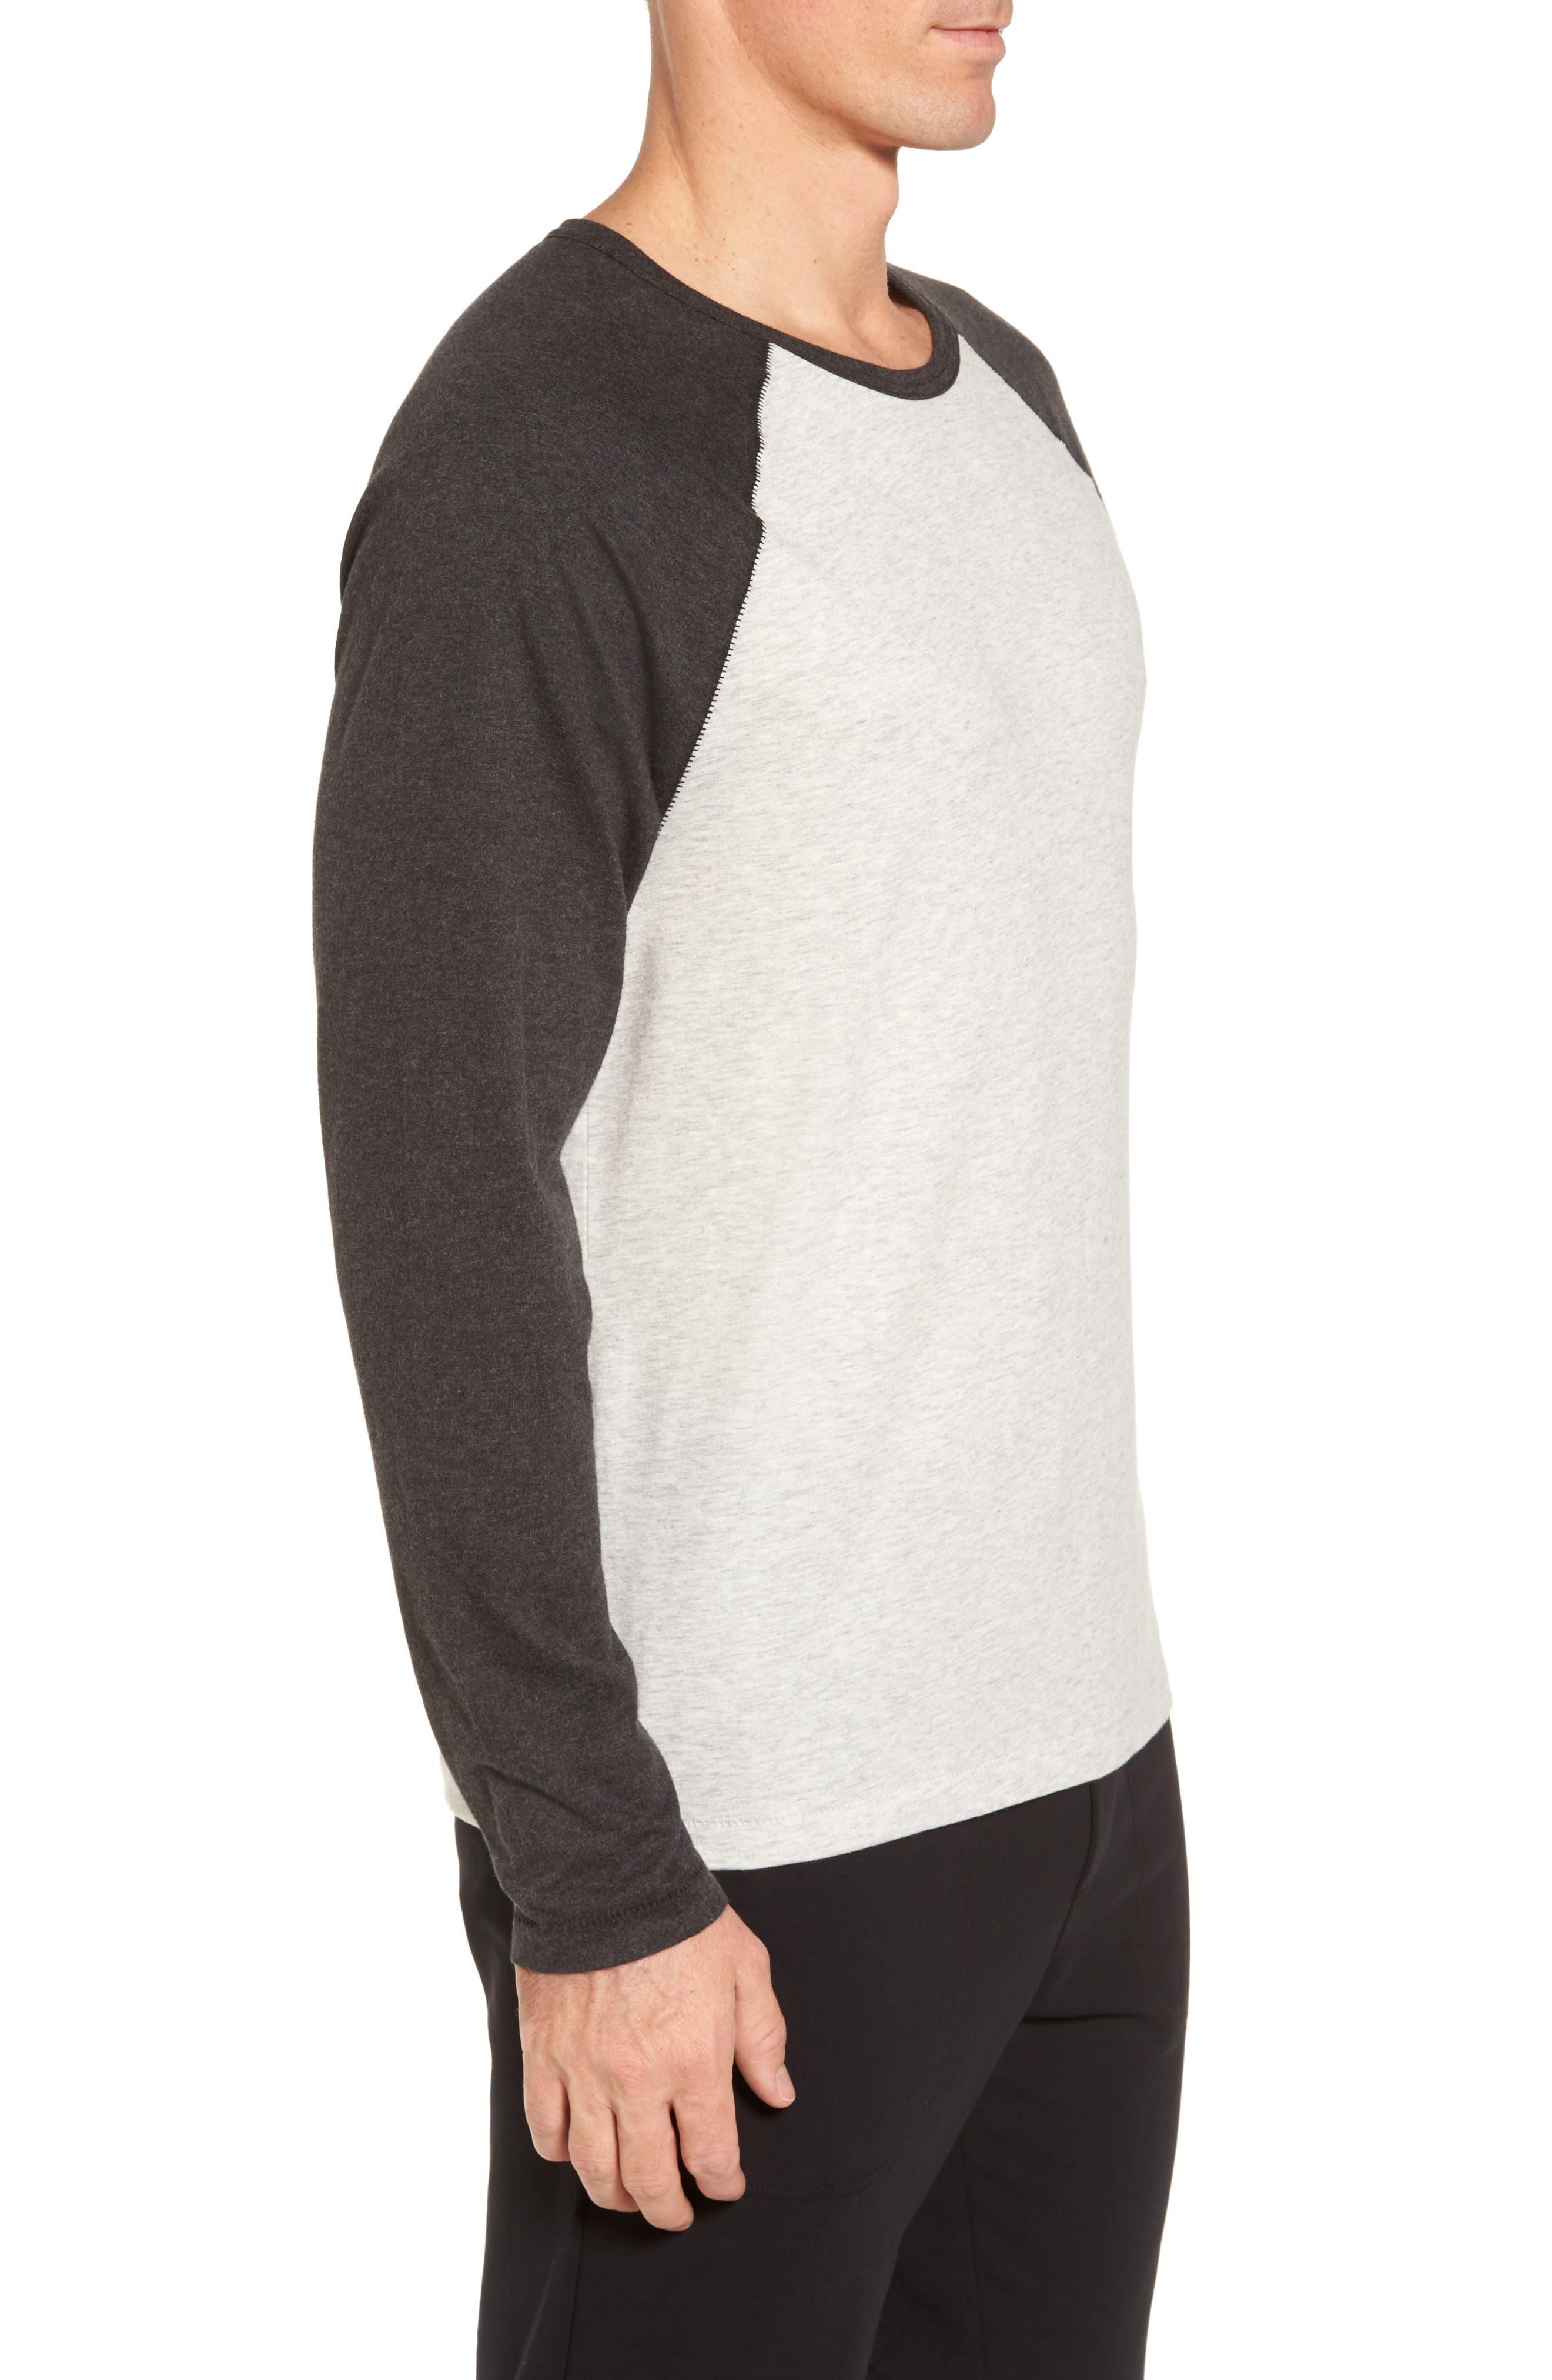 Stefan Raglan T-Shirt,                             Alternate thumbnail 4, color,                             Seal Heather/ Black Bear